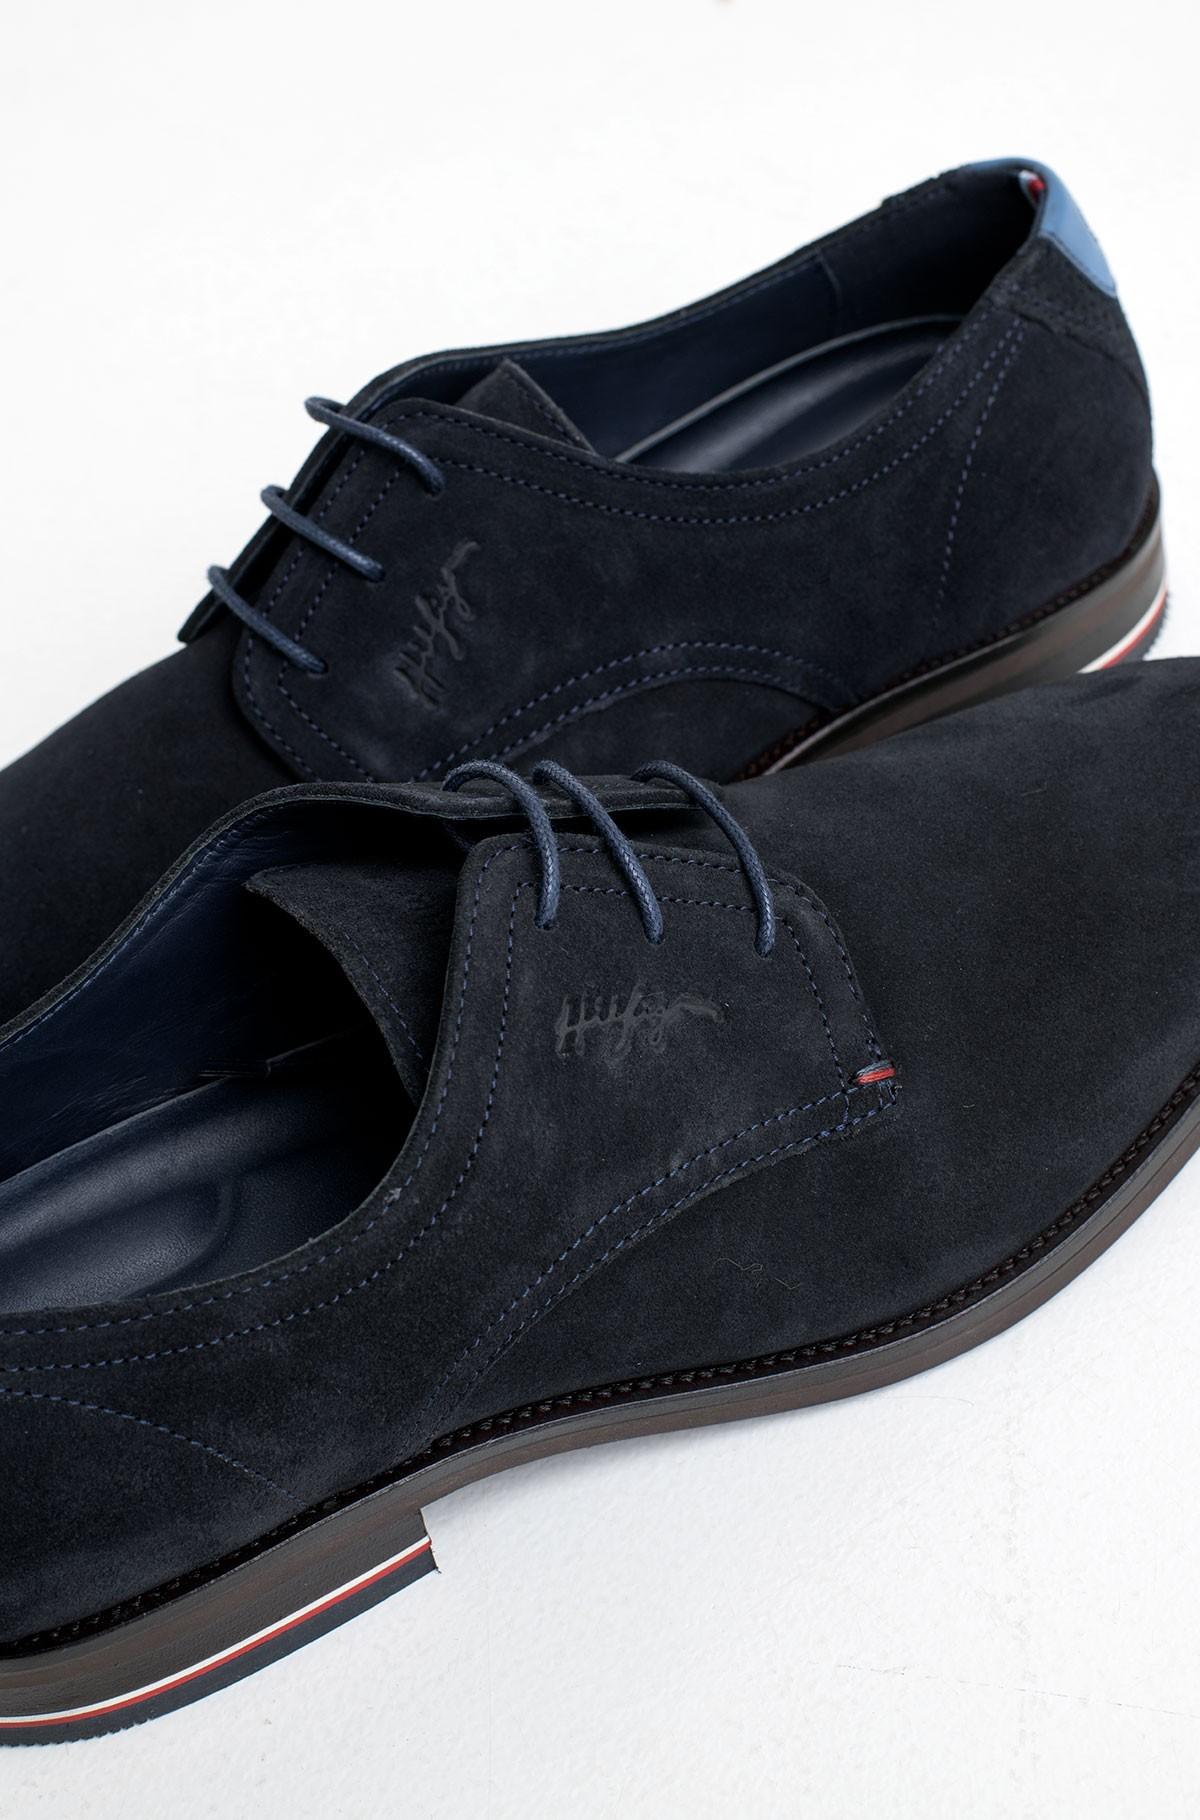 Shoes SIGNATURE HILFIGER SUEDE SHOE-full-2